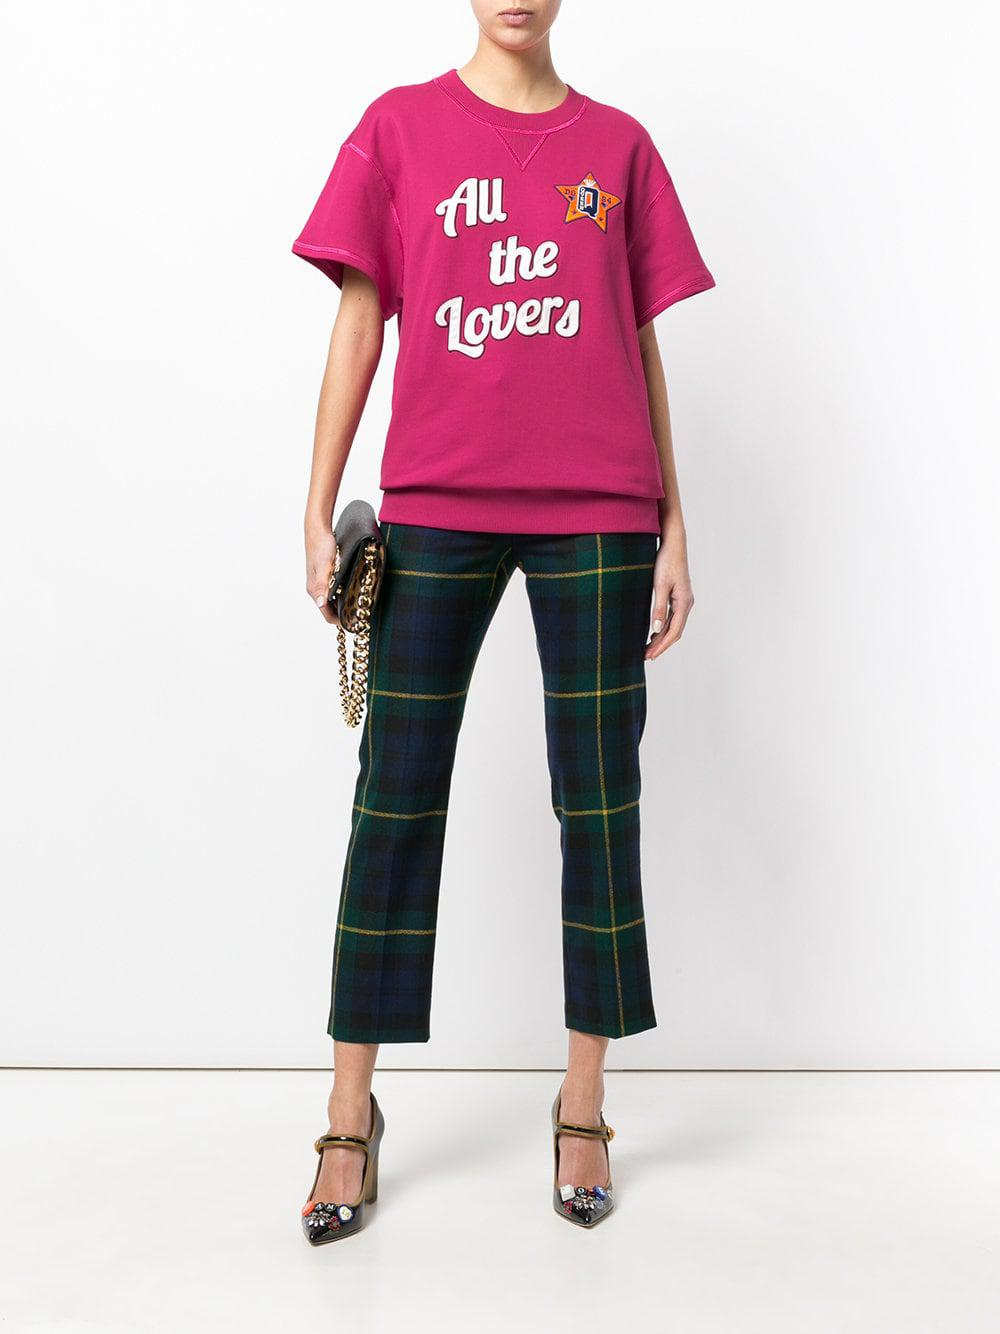 815cb3fe69a1 dolce-gabbana-Pink-All-The-Lovers-Short-Sleeved-Sweatshirt.jpeg